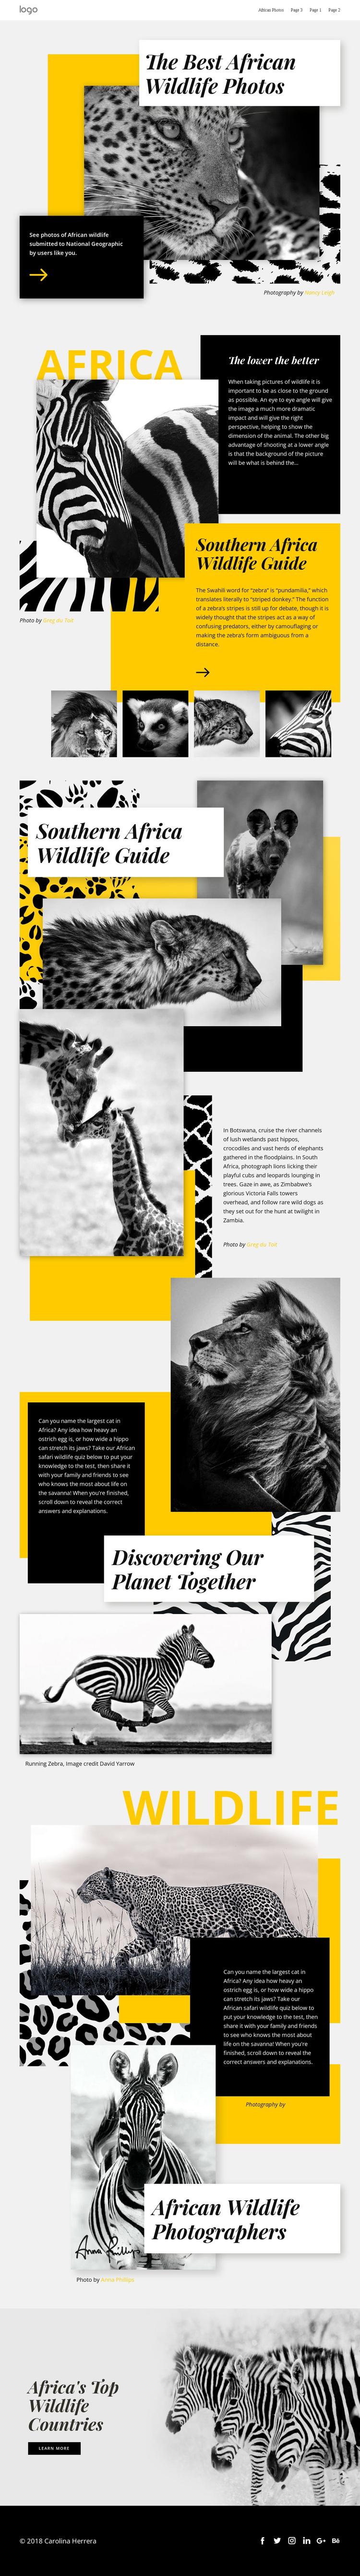 Best African Photos Joomla Page Builder